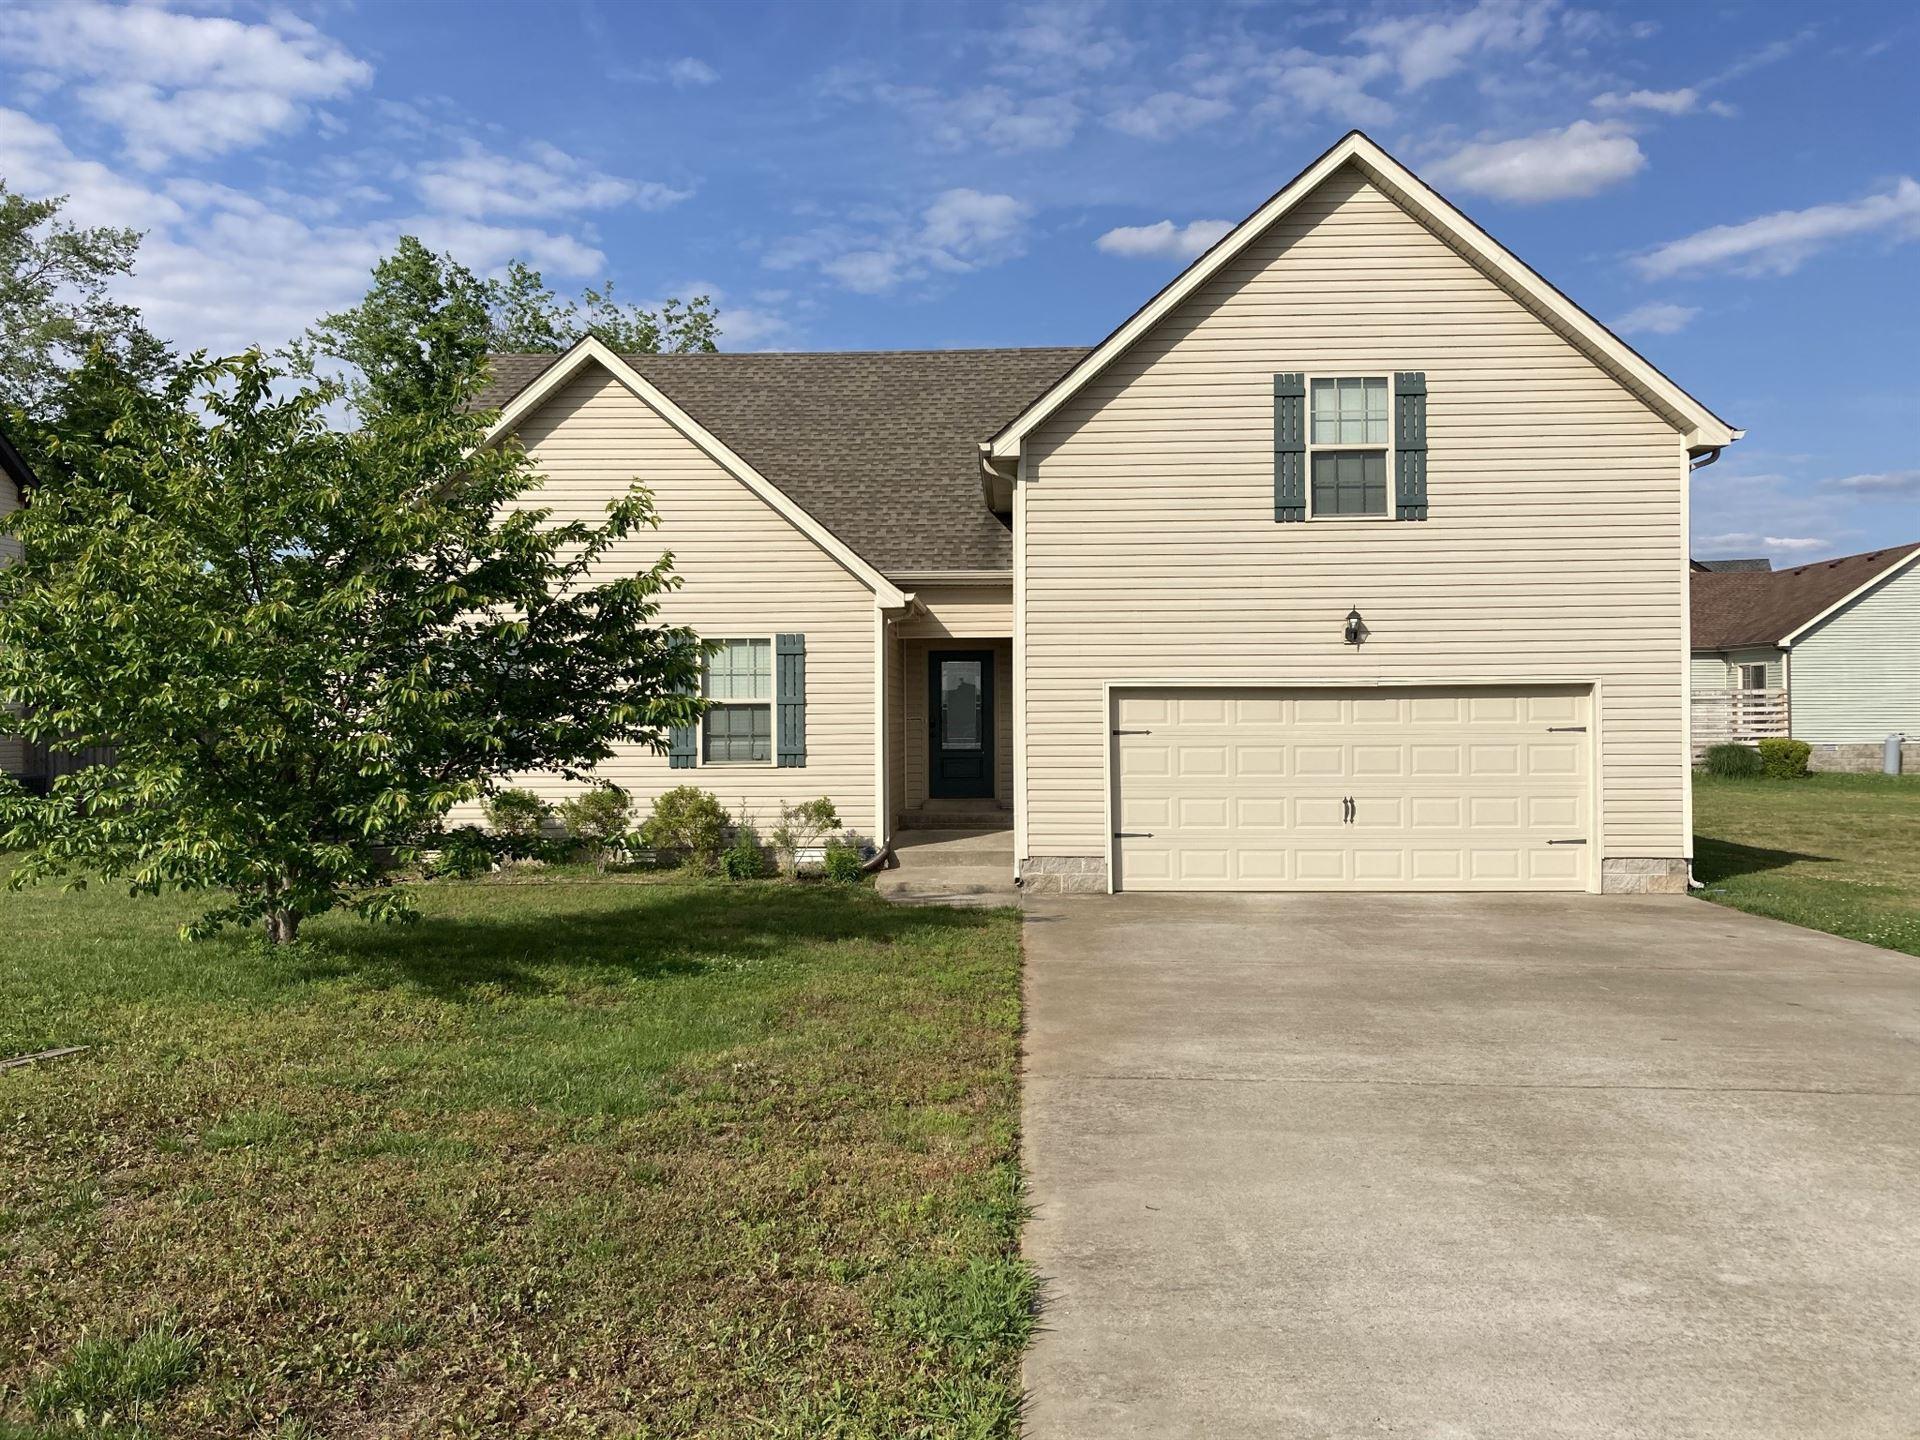 591 Tracy Ln, Clarksville, TN 37040 - MLS#: 2254050